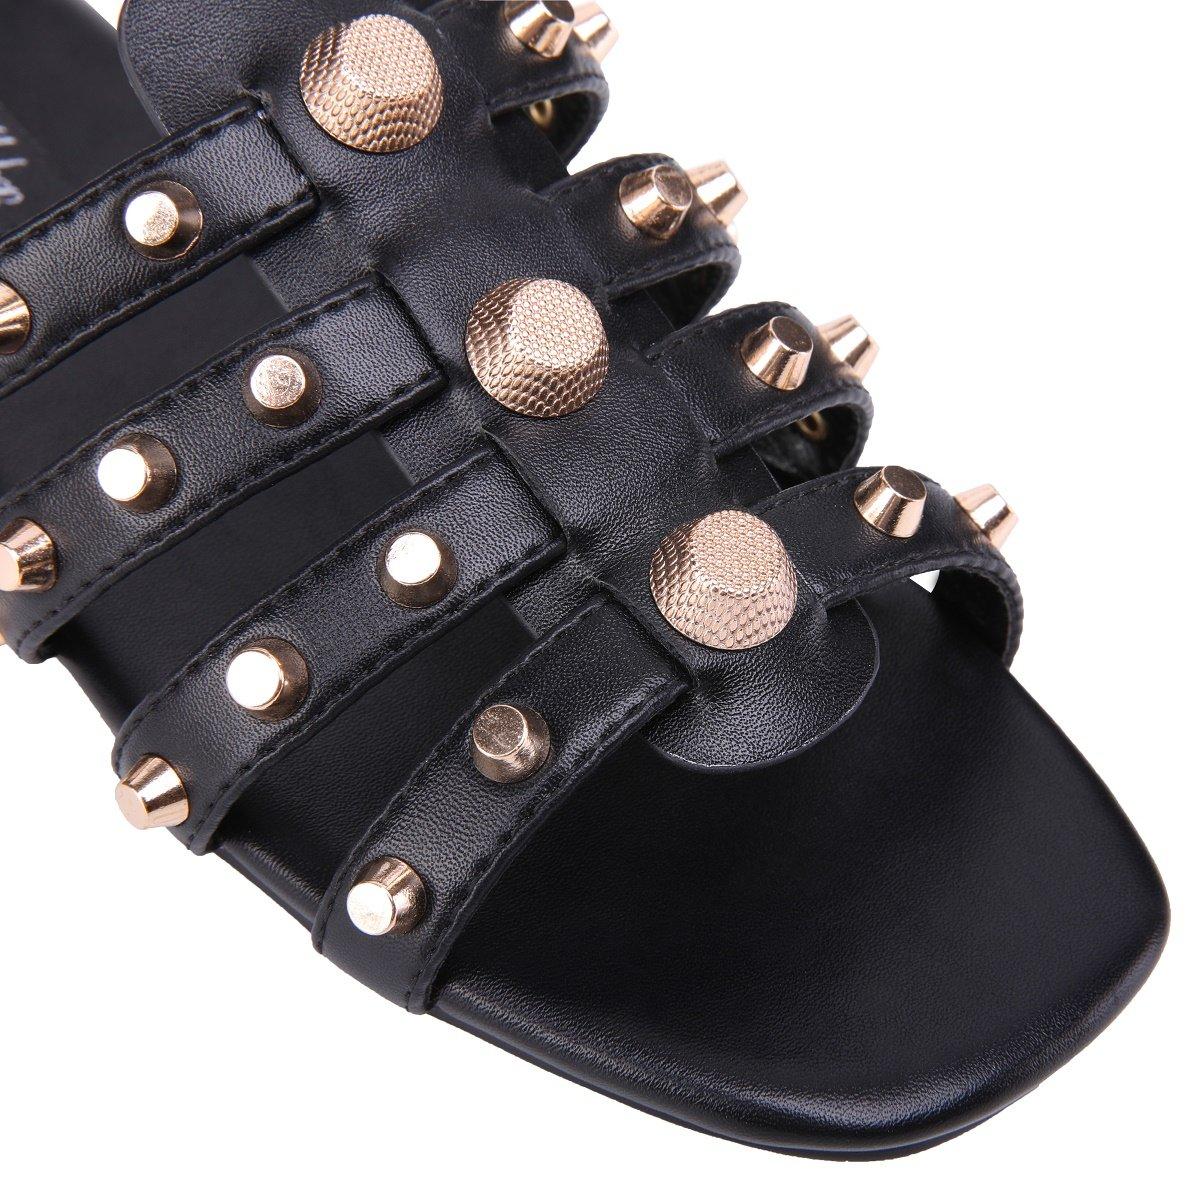 onlymaker Women's Gold Metal Studded Slide Sandals Open Toe Cut Out Slip on Flat Dress Slipper Shoes B07FLFJRBC 11 B(M) US|Black Gold